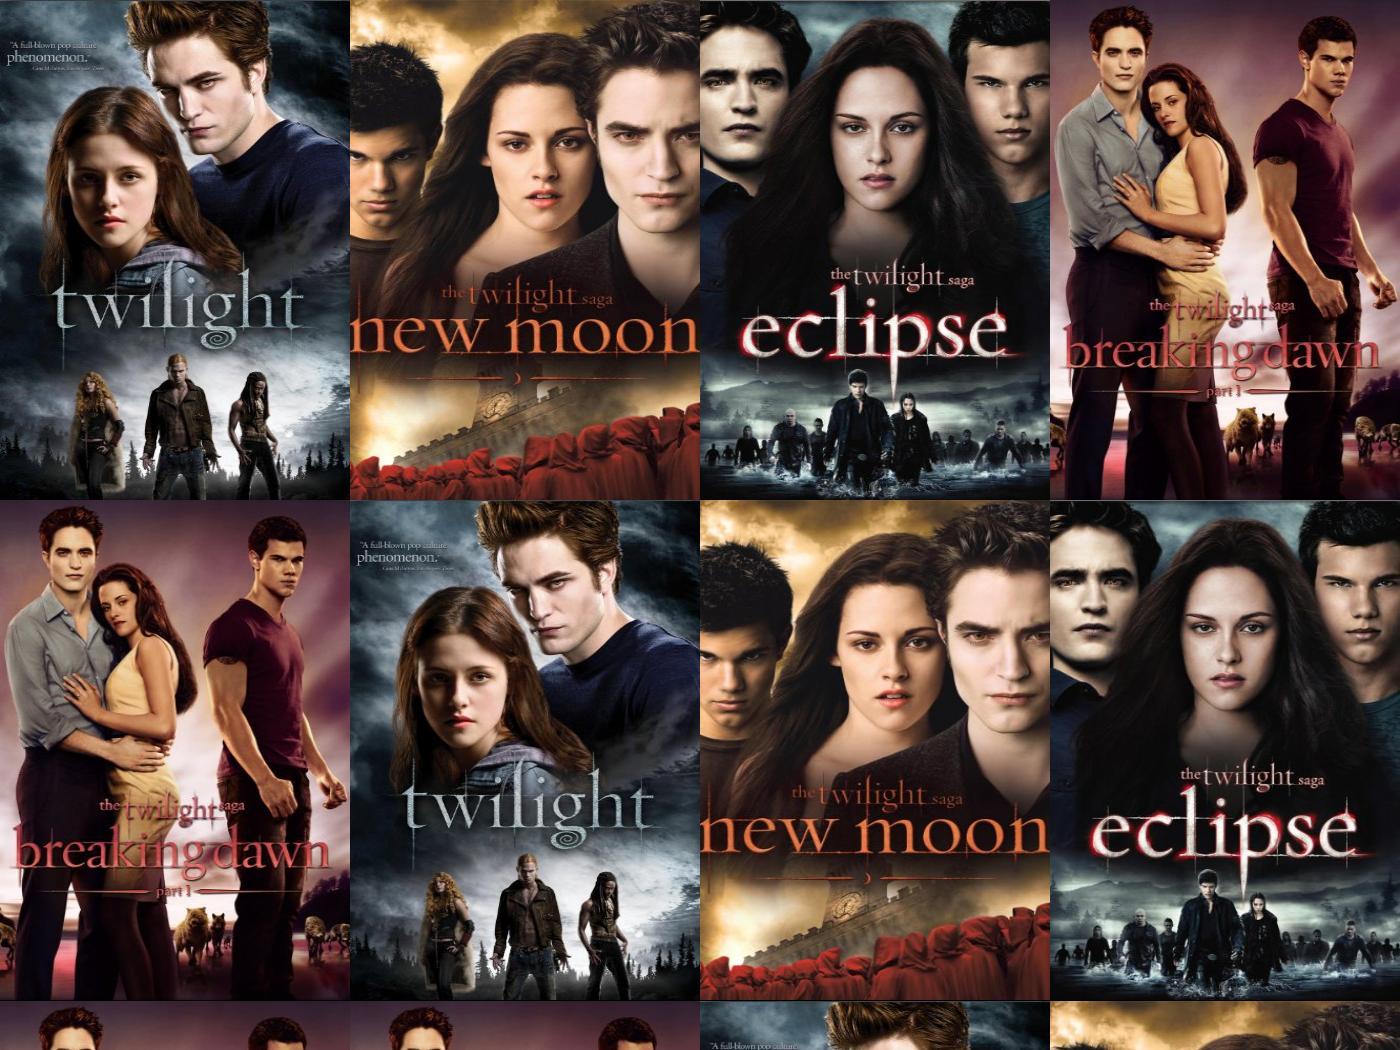 twilight new moon wallpaper for desktop